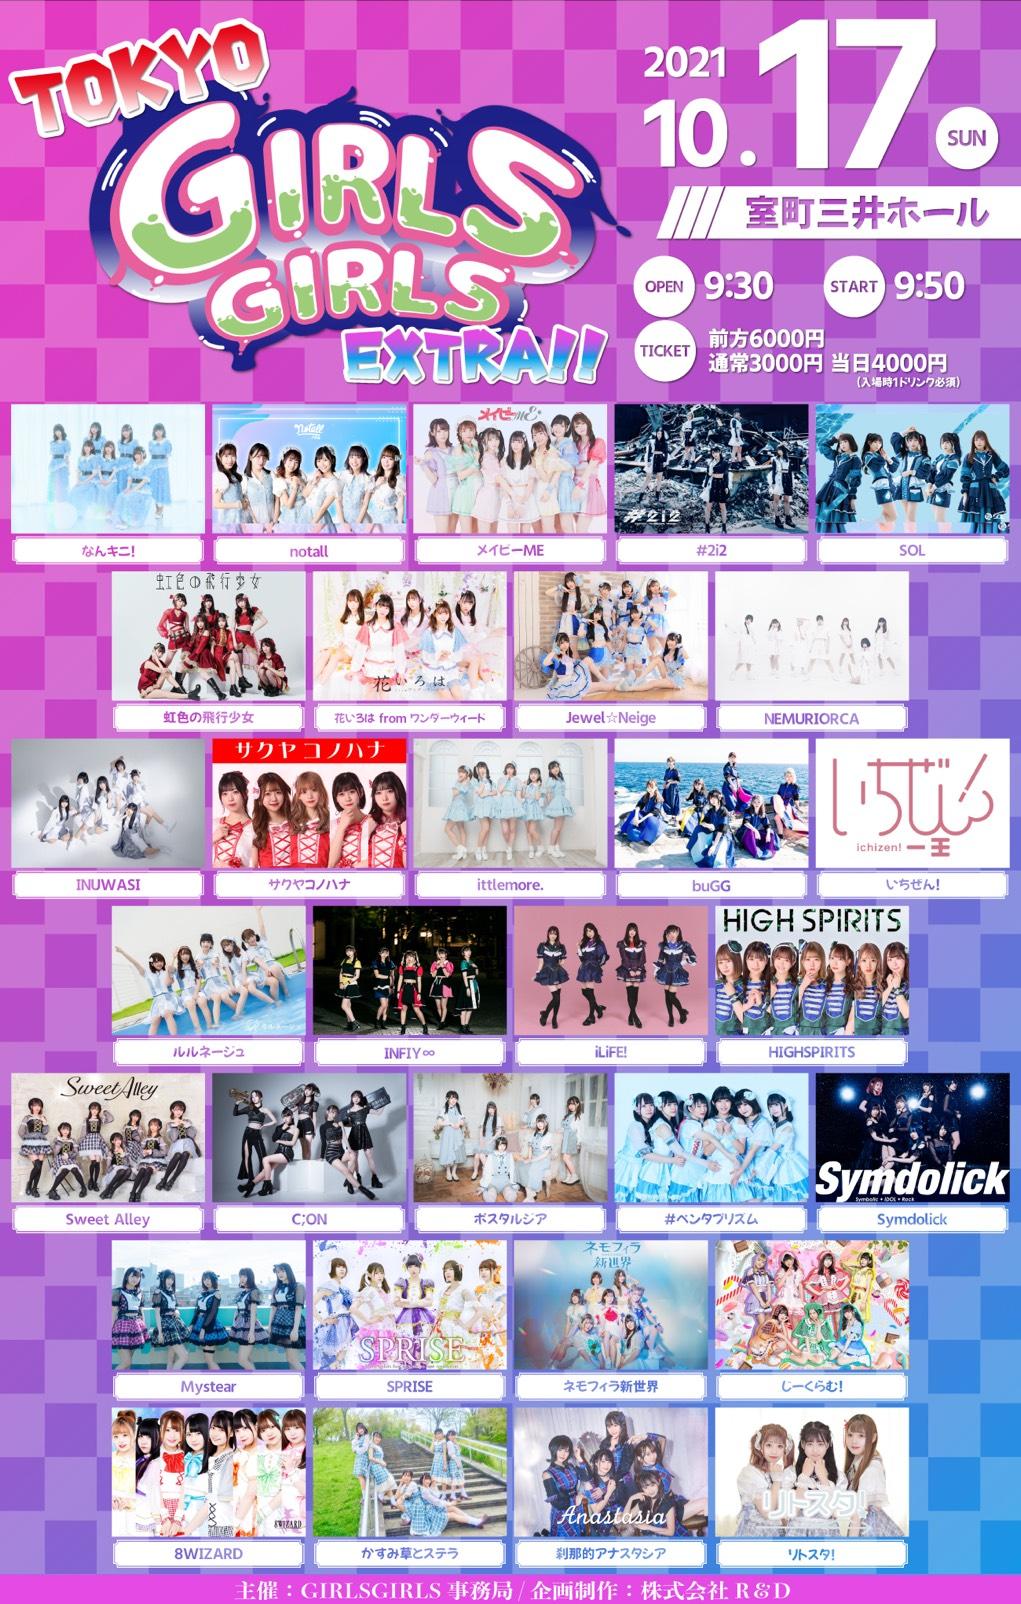 10/17(日) TOKYO GIRLS GIRLS extra!!